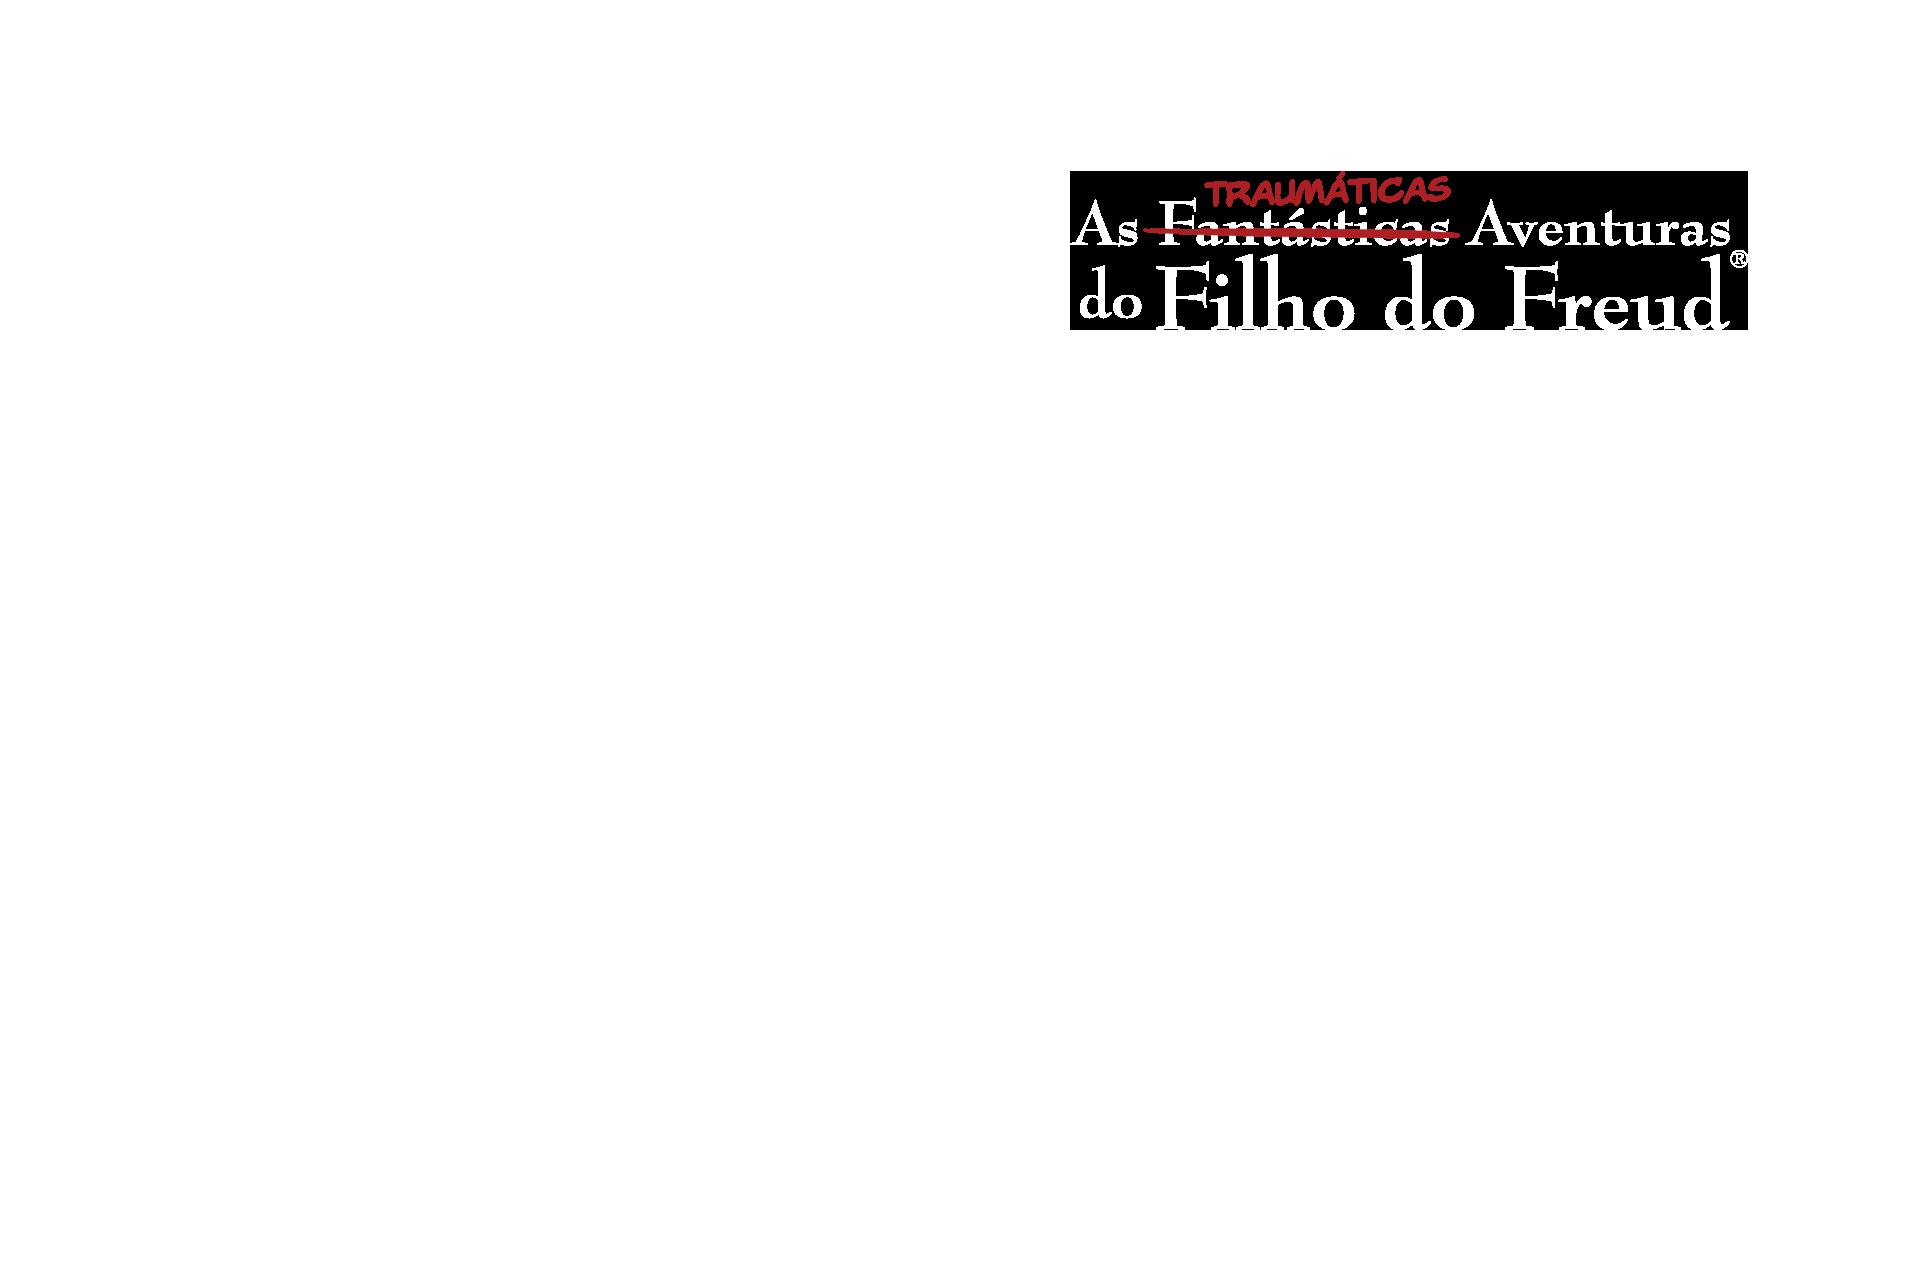 Projeto | Filho do Freud